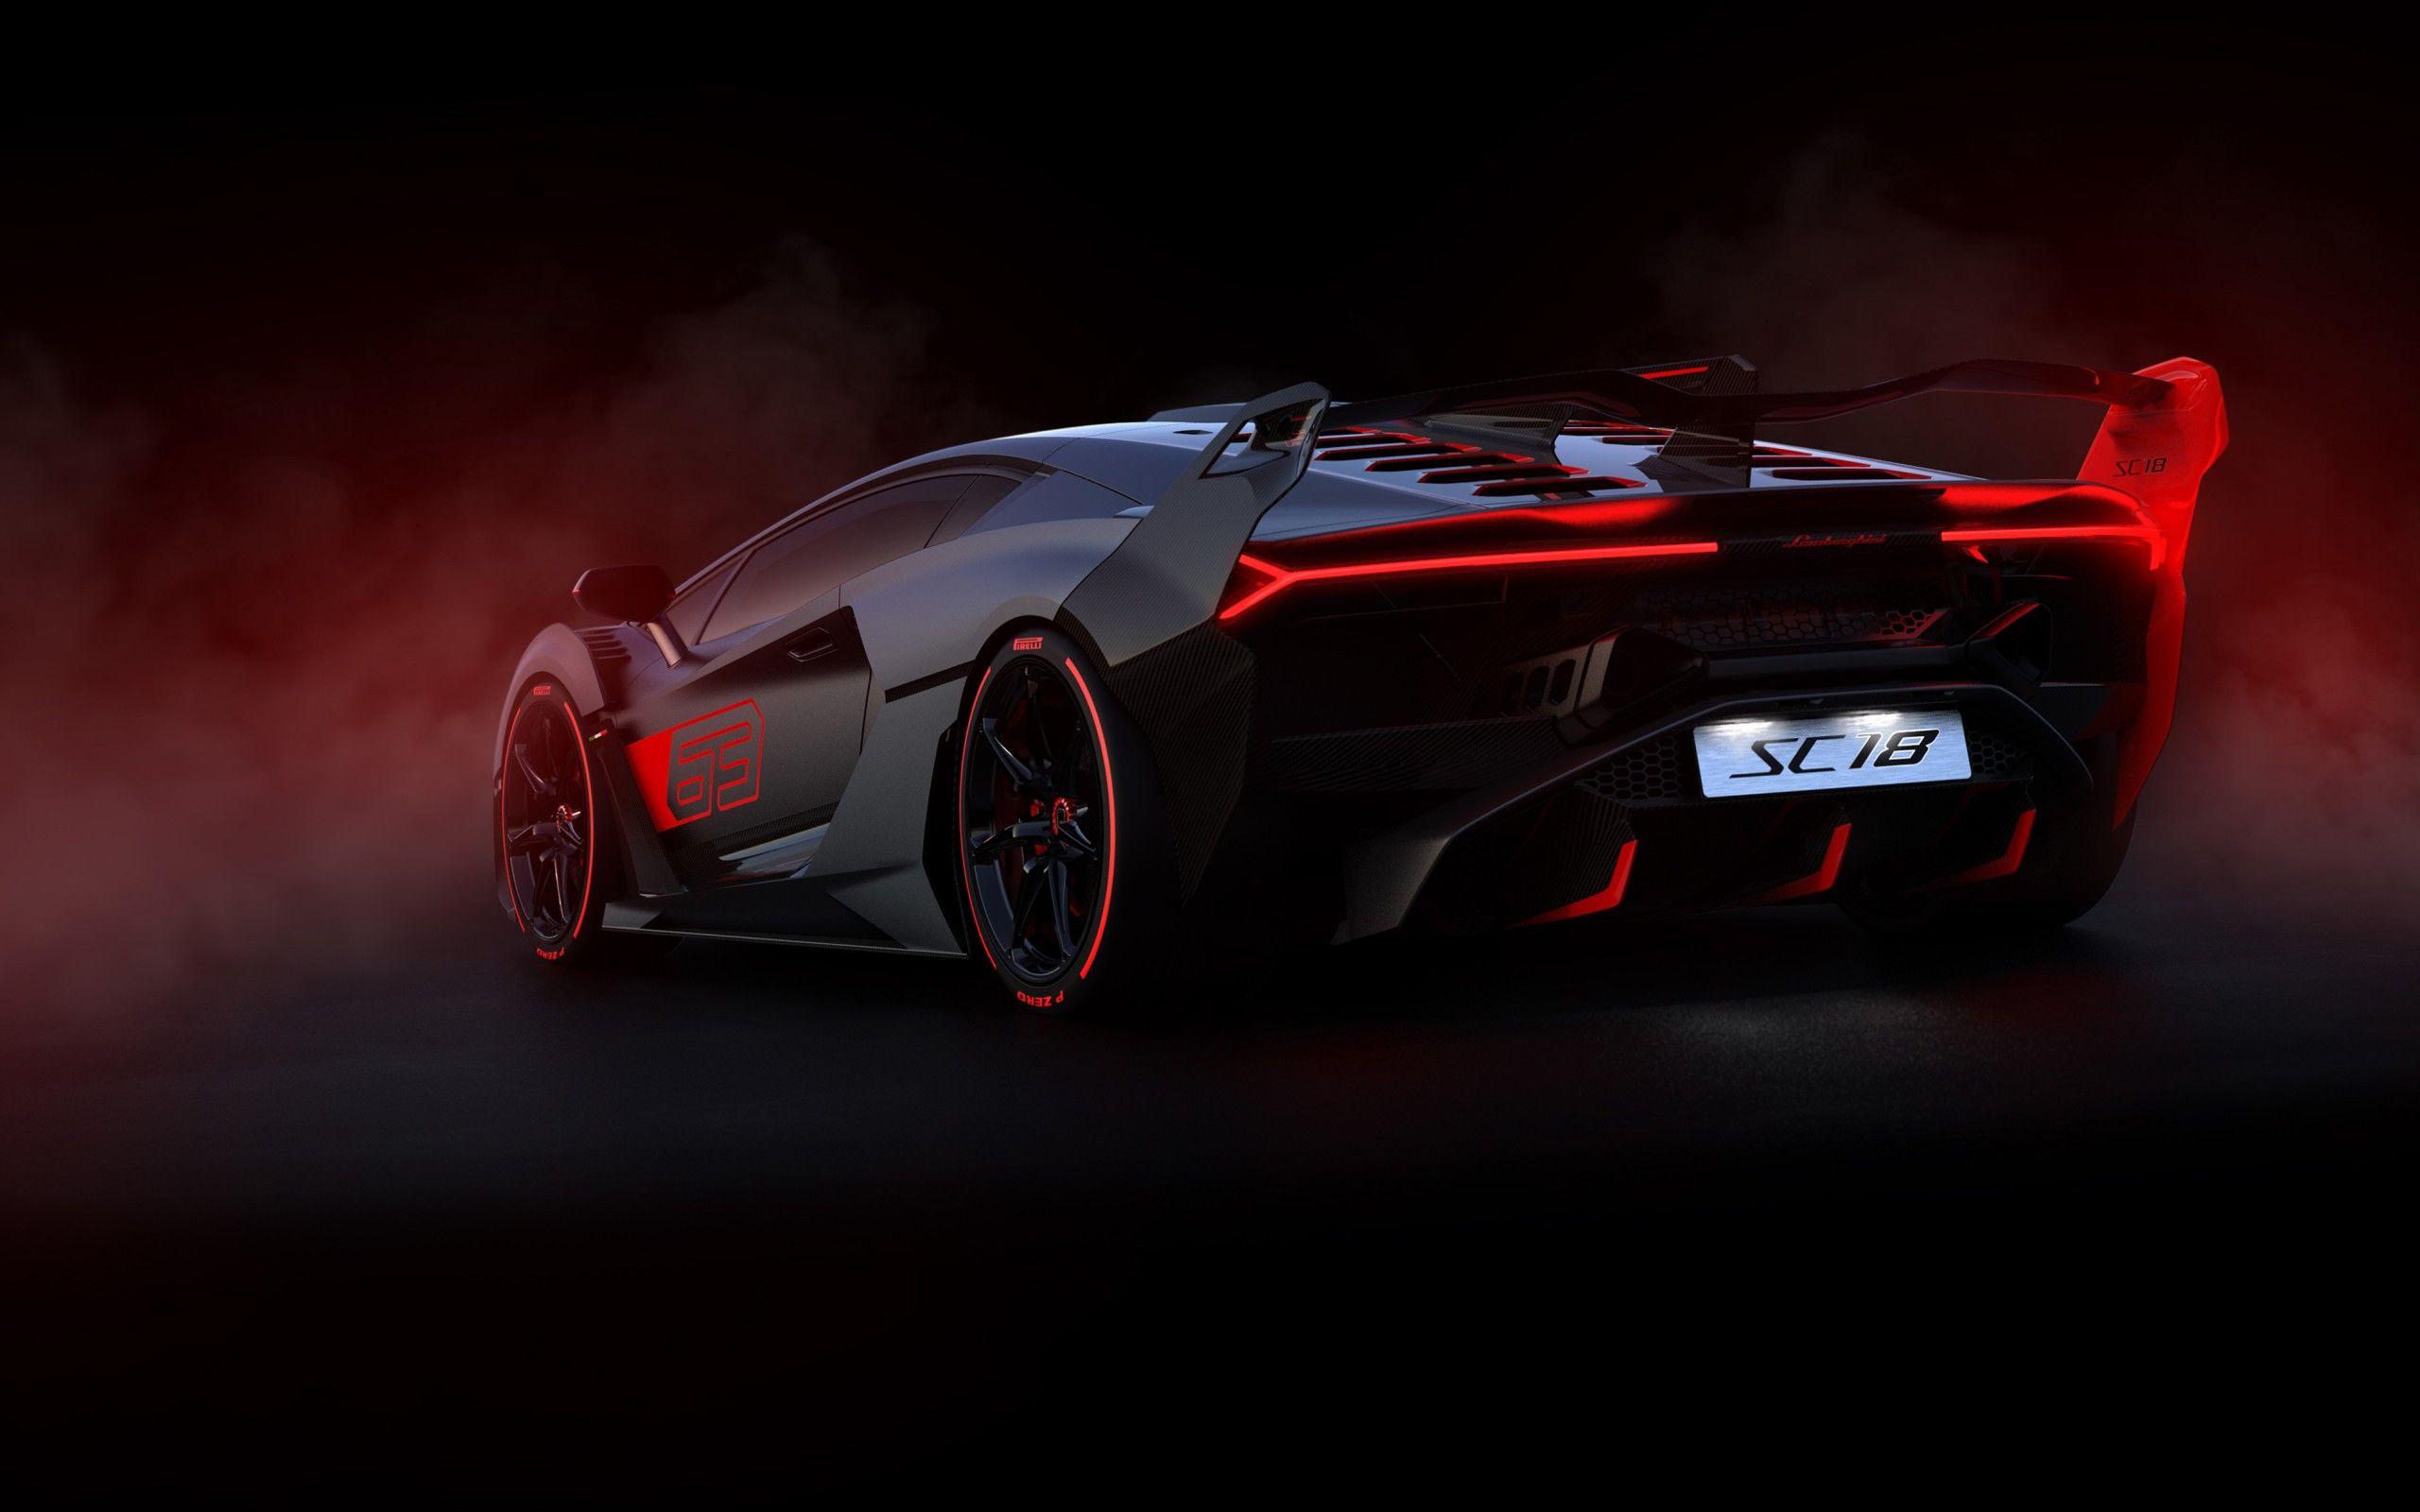 Inspirational Red And Black Lamborghini Sports Car Wallpaper Lamborghini Aventador Wallpaper Super Cars